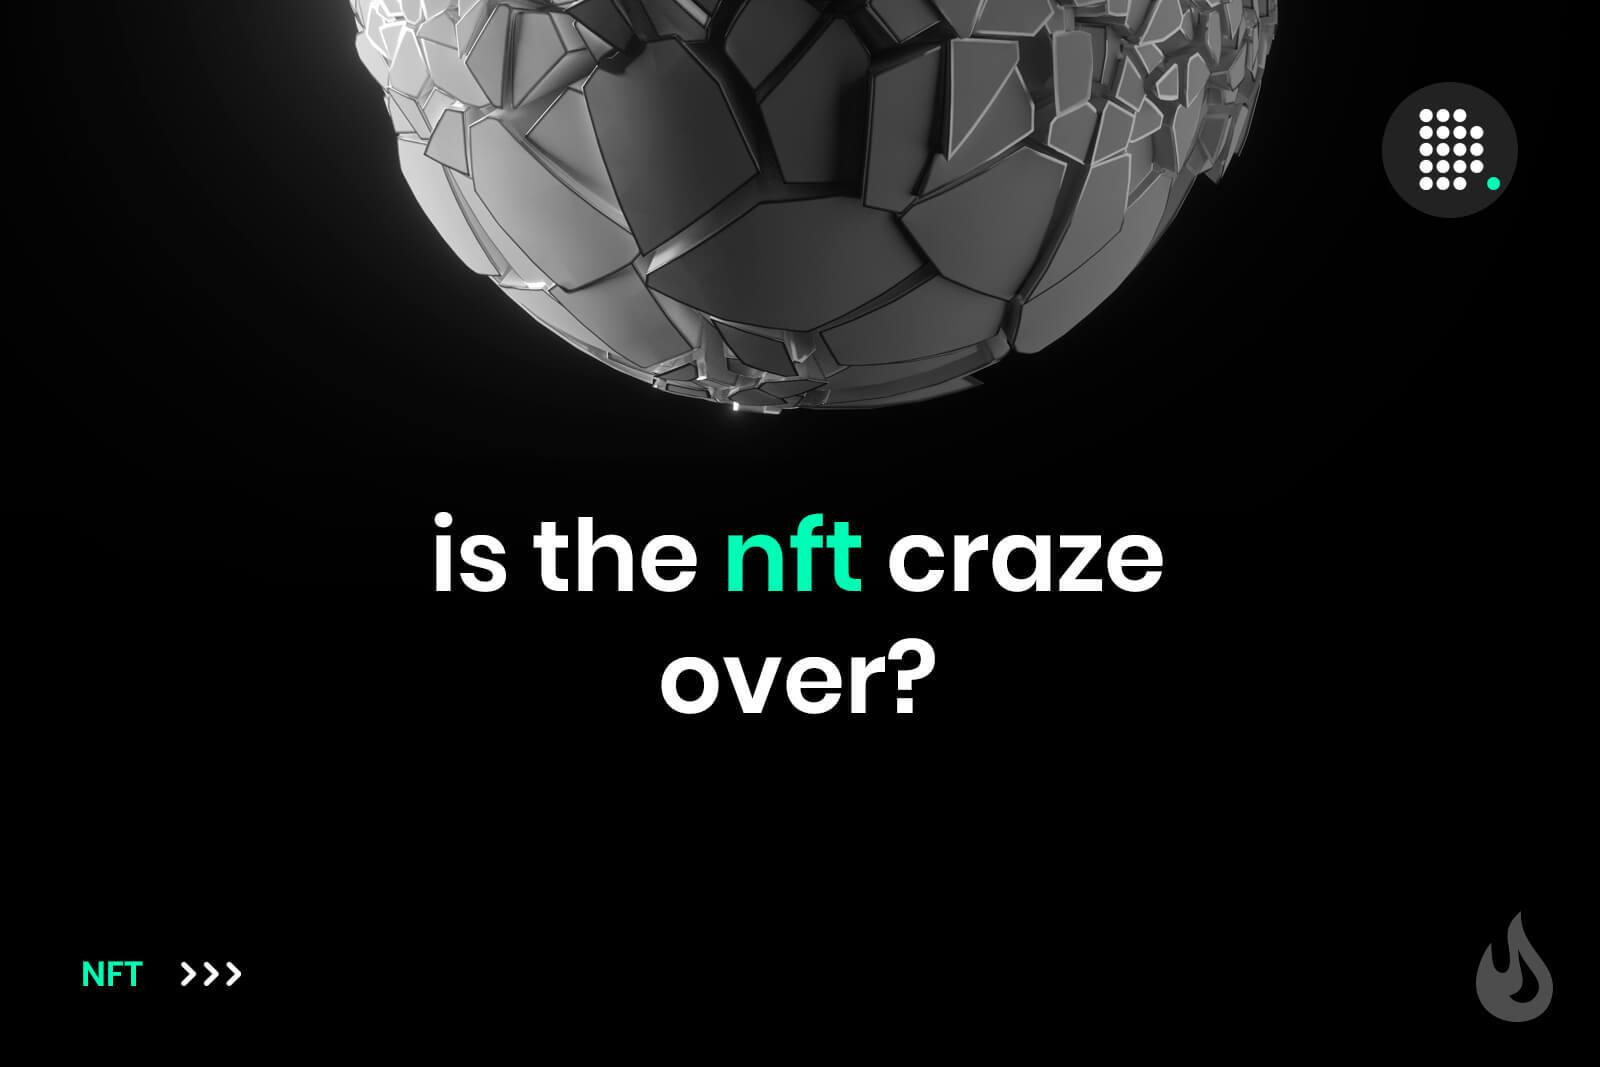 NFT sales reach 220 million dollars in February 2021